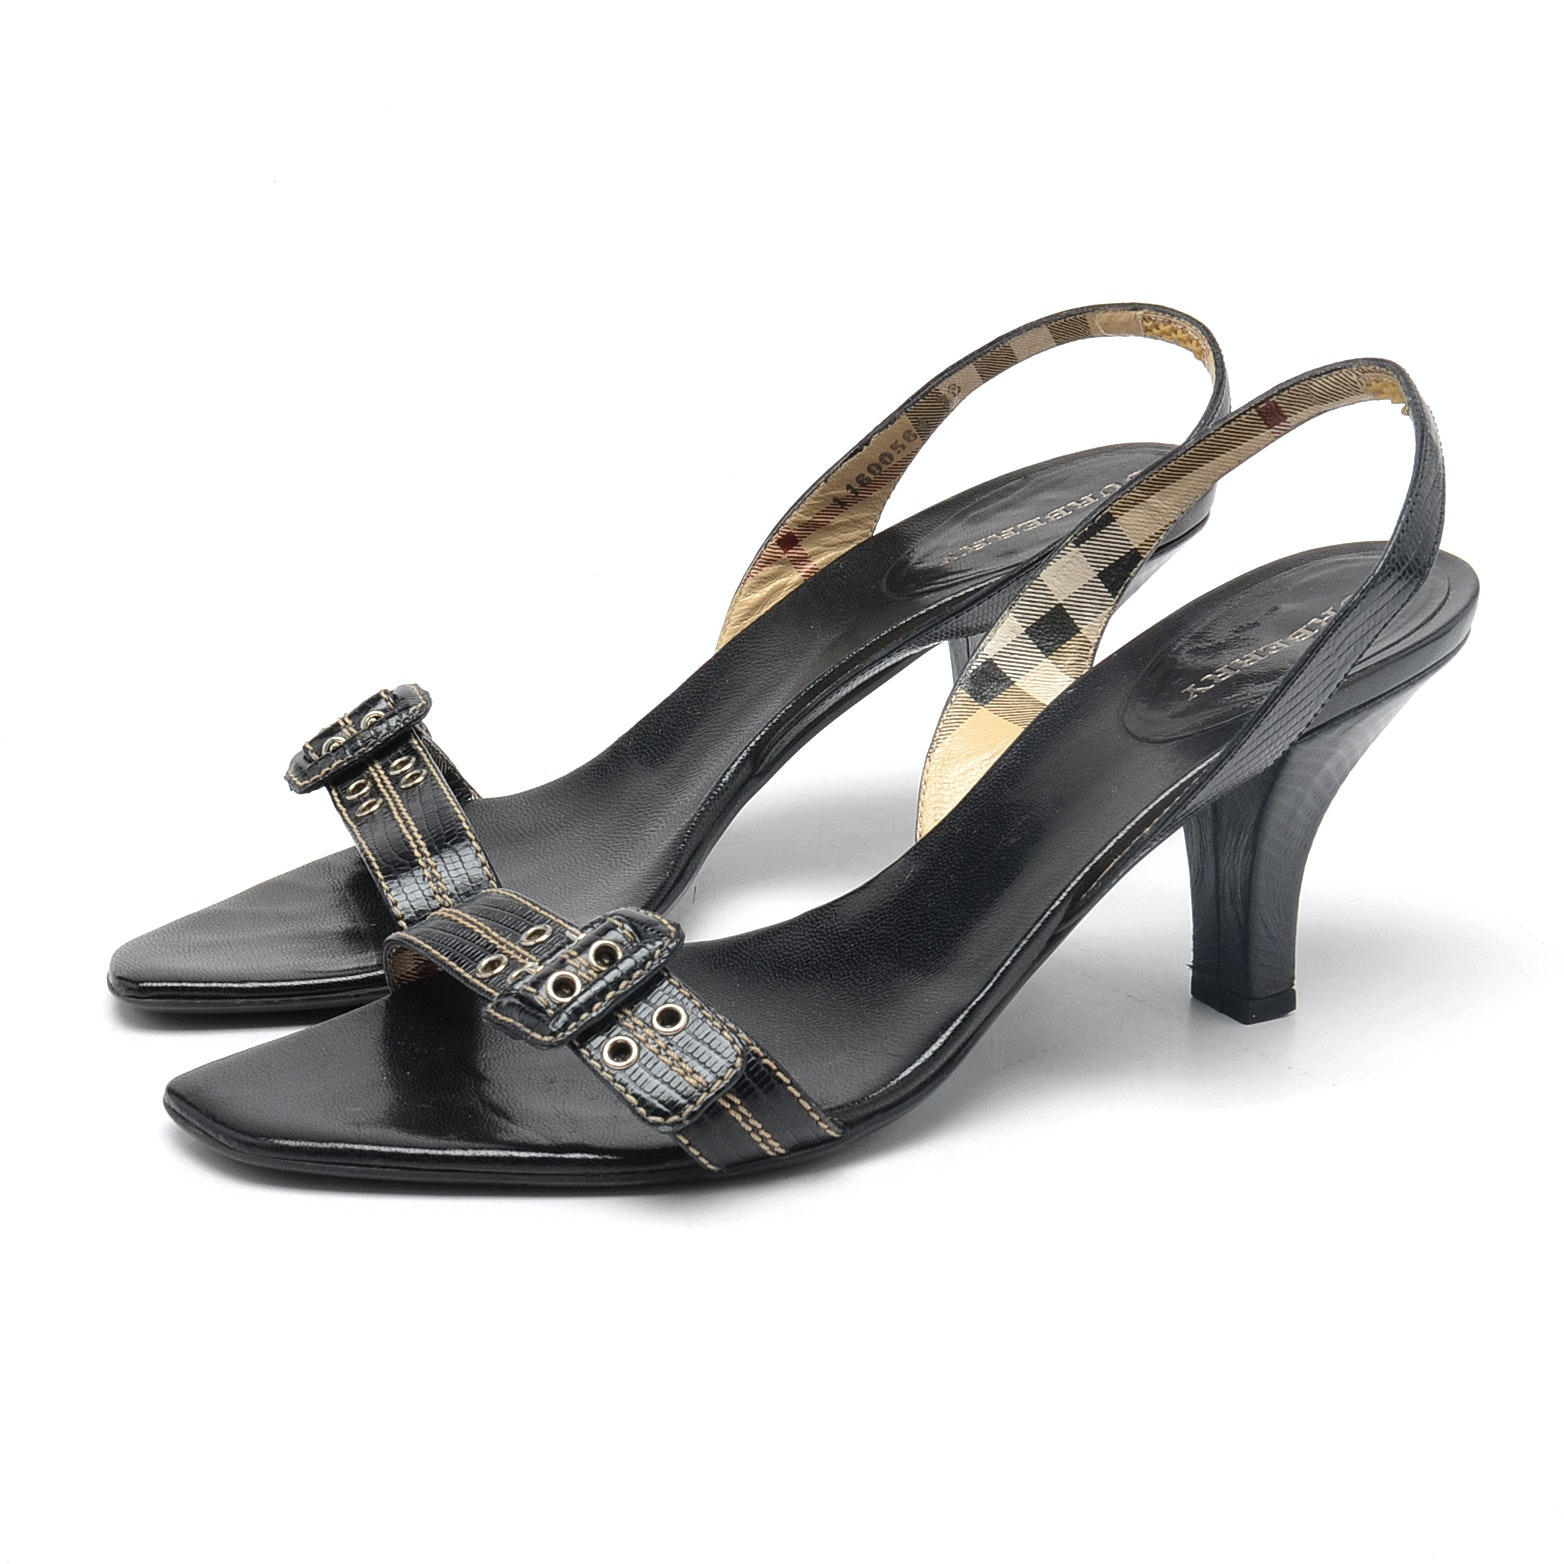 Burberry Slingback Sandals